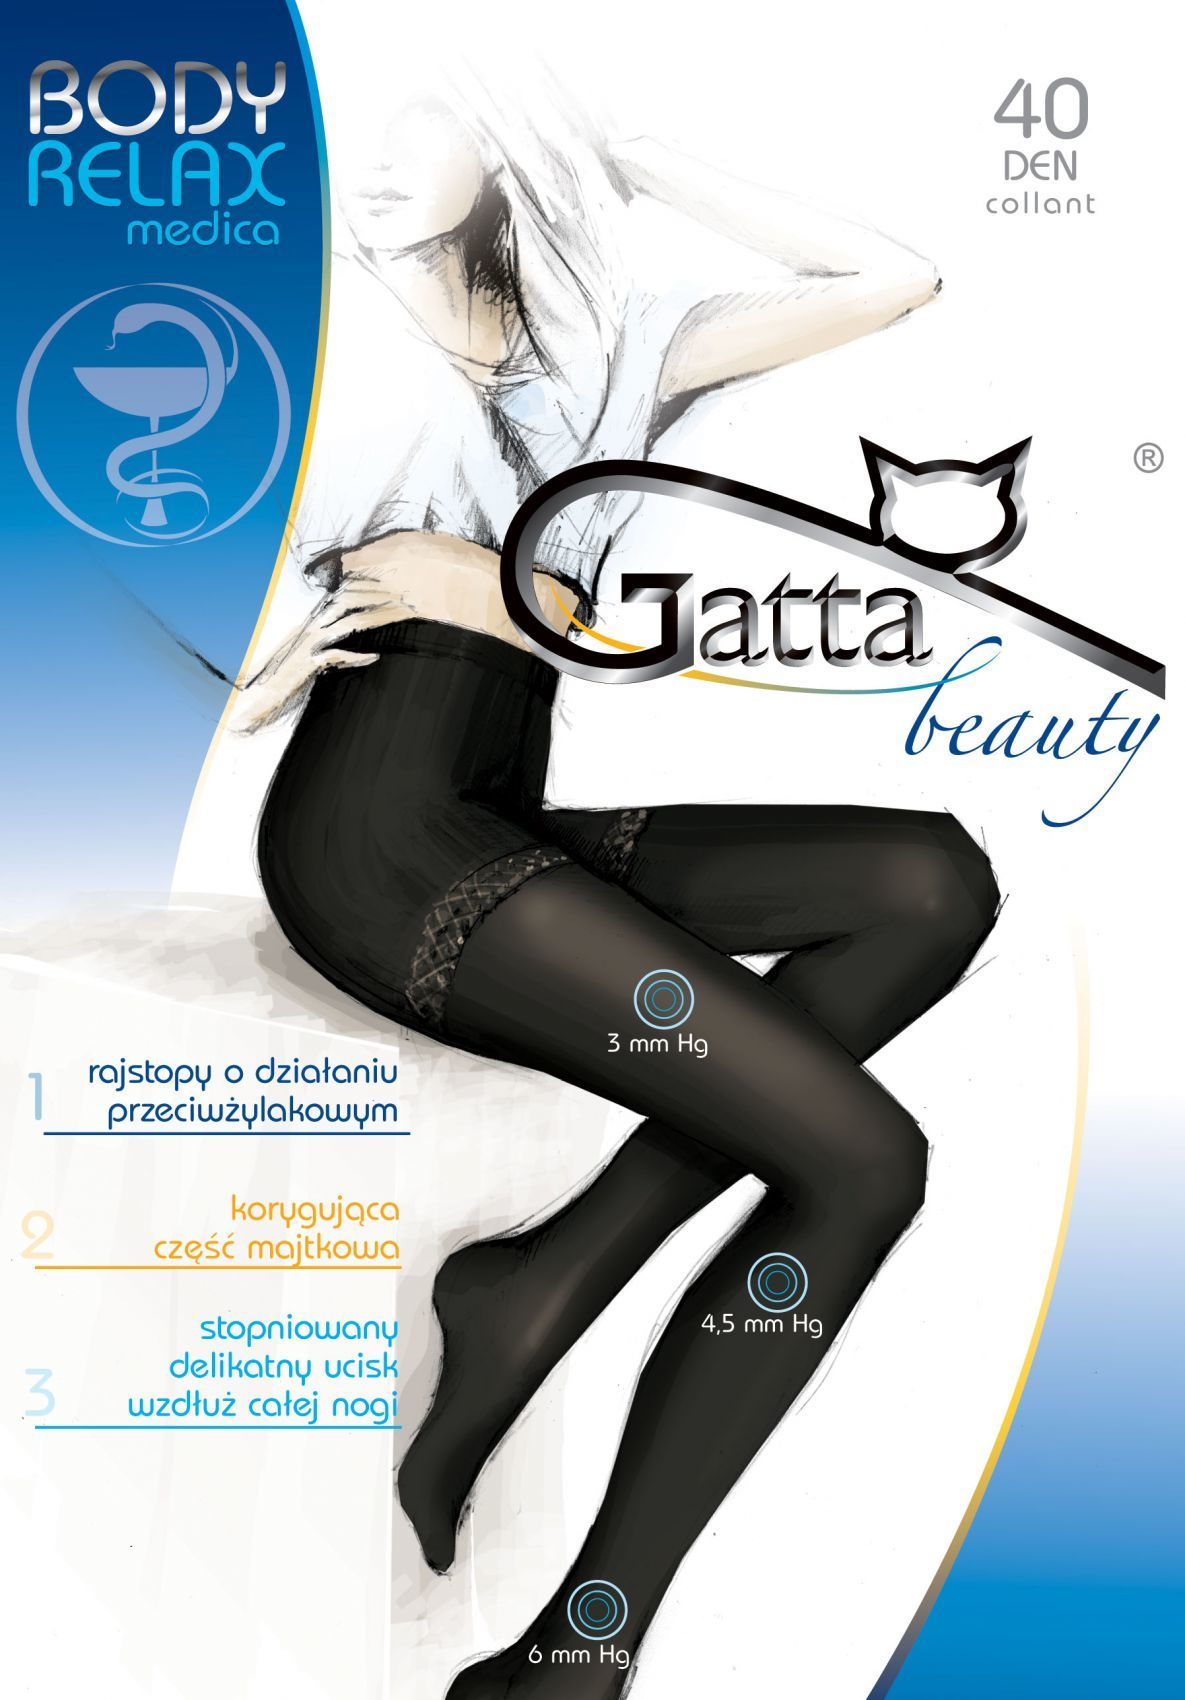 RAJSTOPY GATTA B RELAXMEDICA 40XL